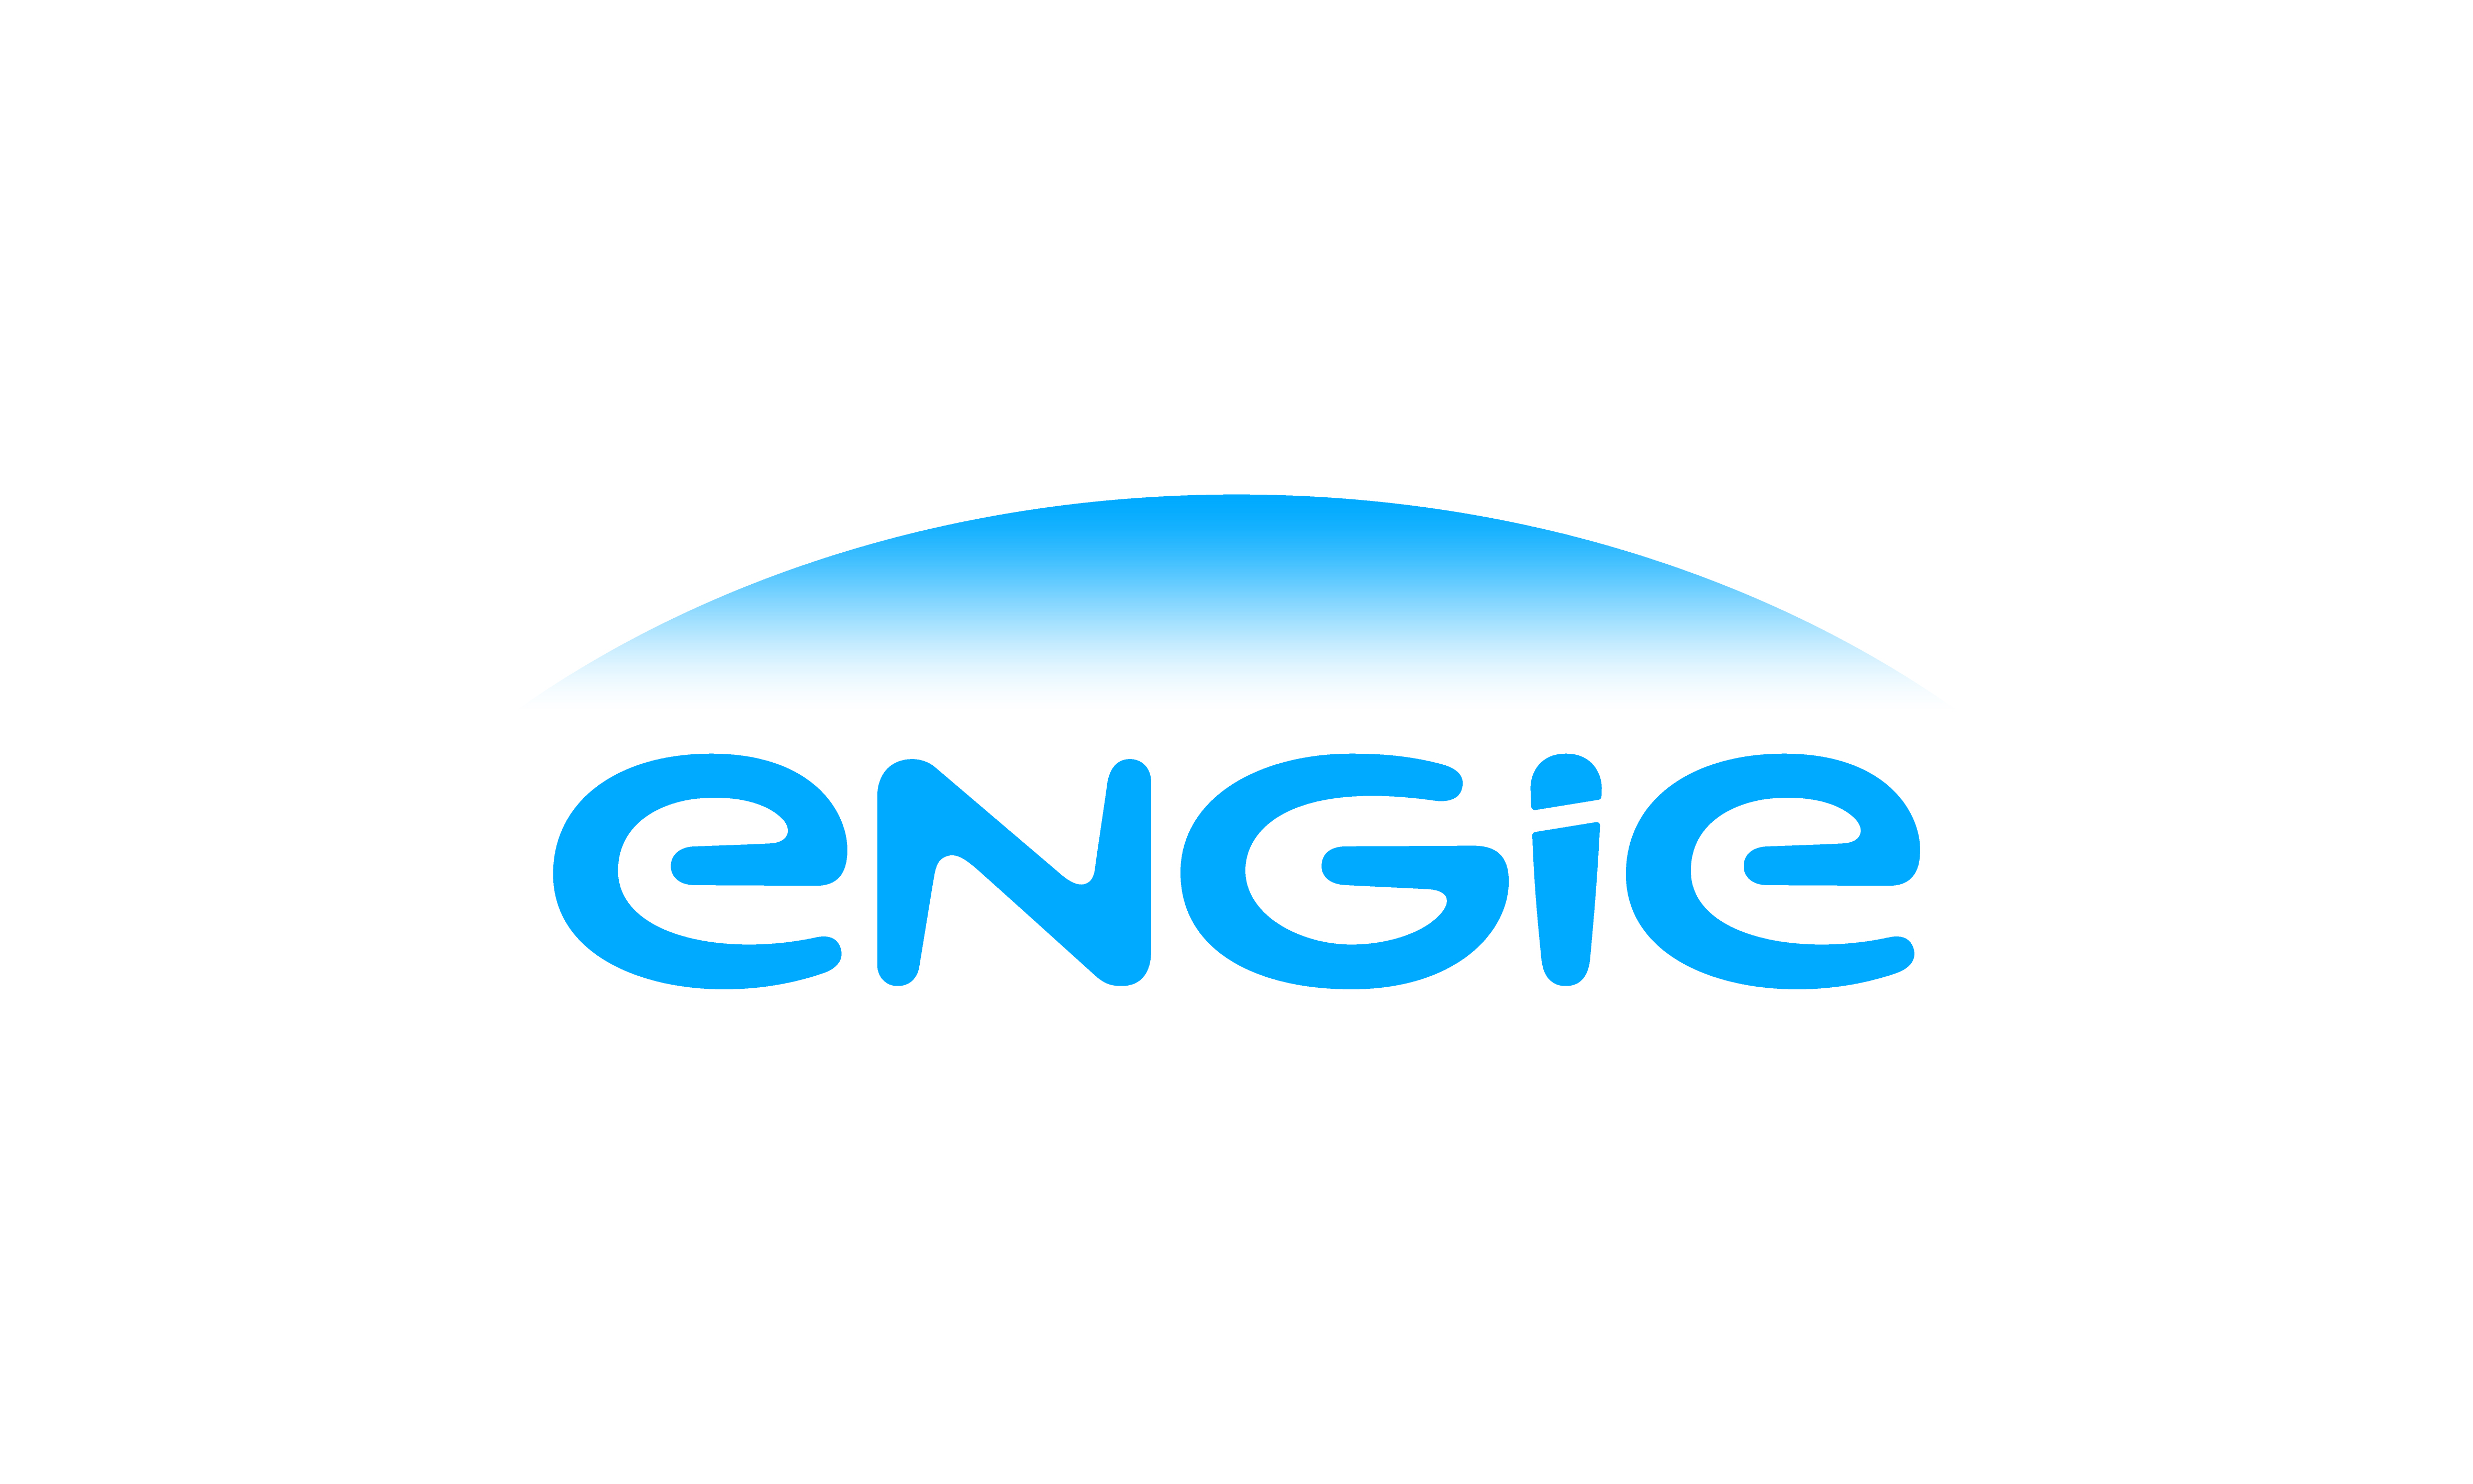 ENGIE Hellas: Επενδύουμε στην καινοτόμο εξοικονόμηση ενέργειας, στοιχηματίζουμε στην ανάκαμψη της ελληνικής οικονομίας